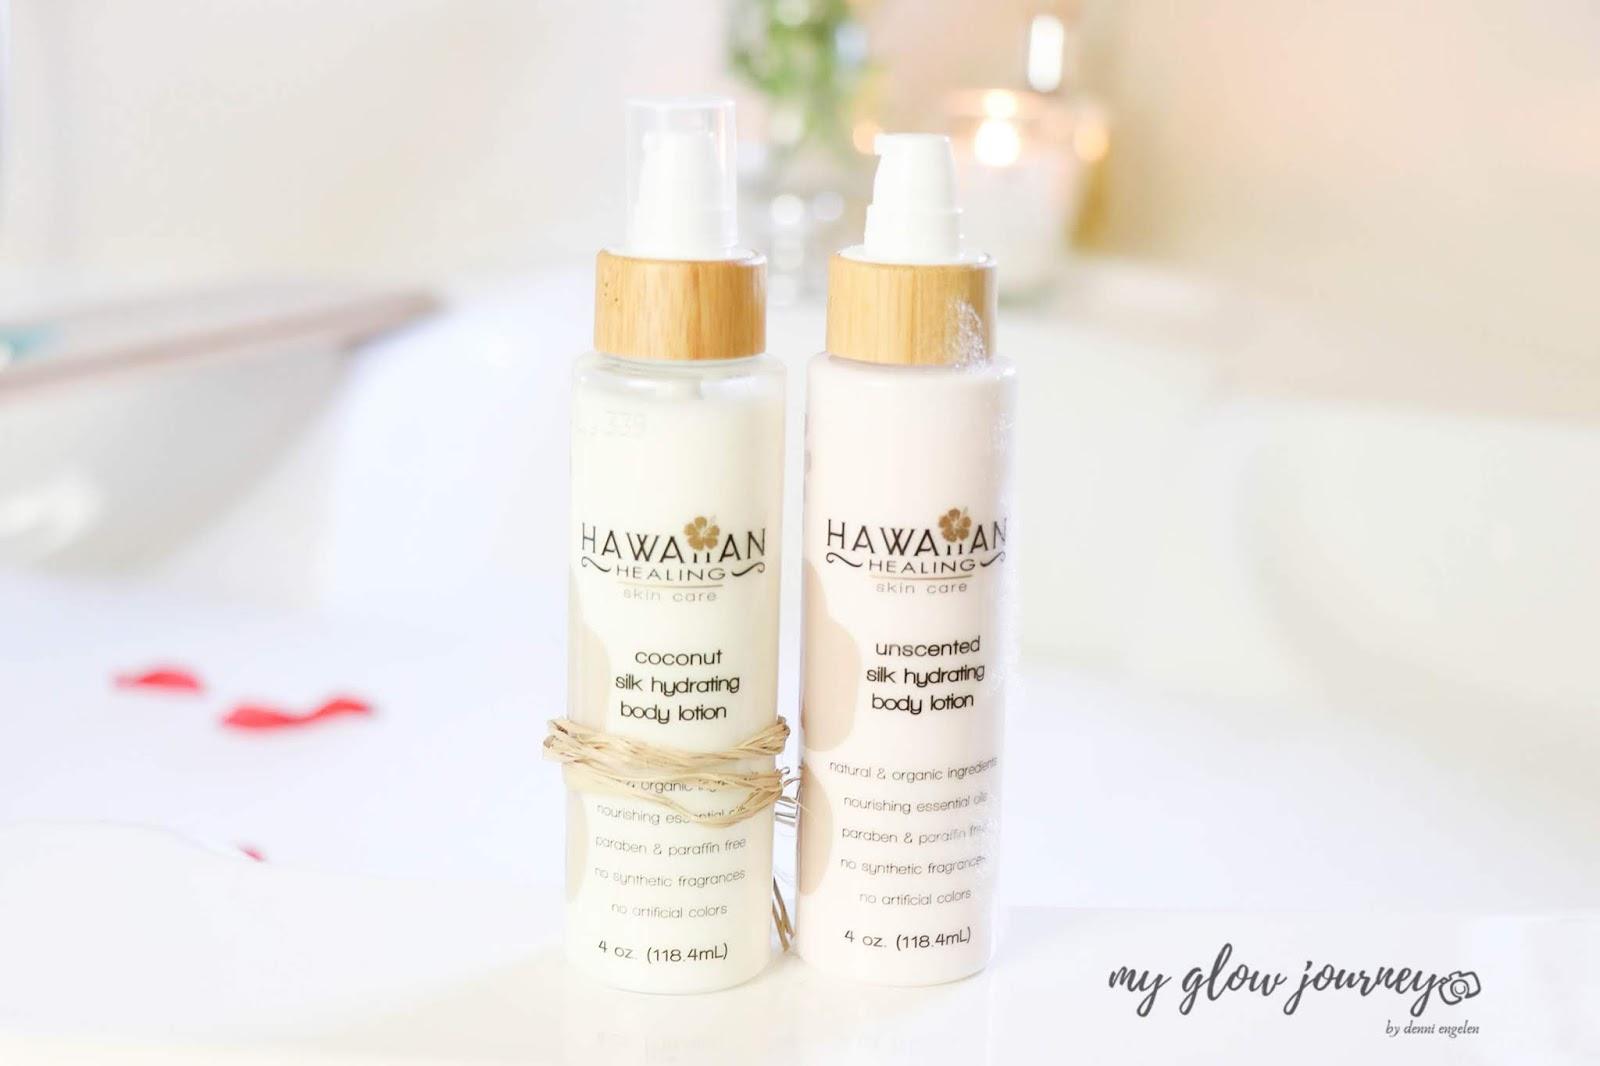 Hawaiian Healing Silk Hydrating Body Lotion